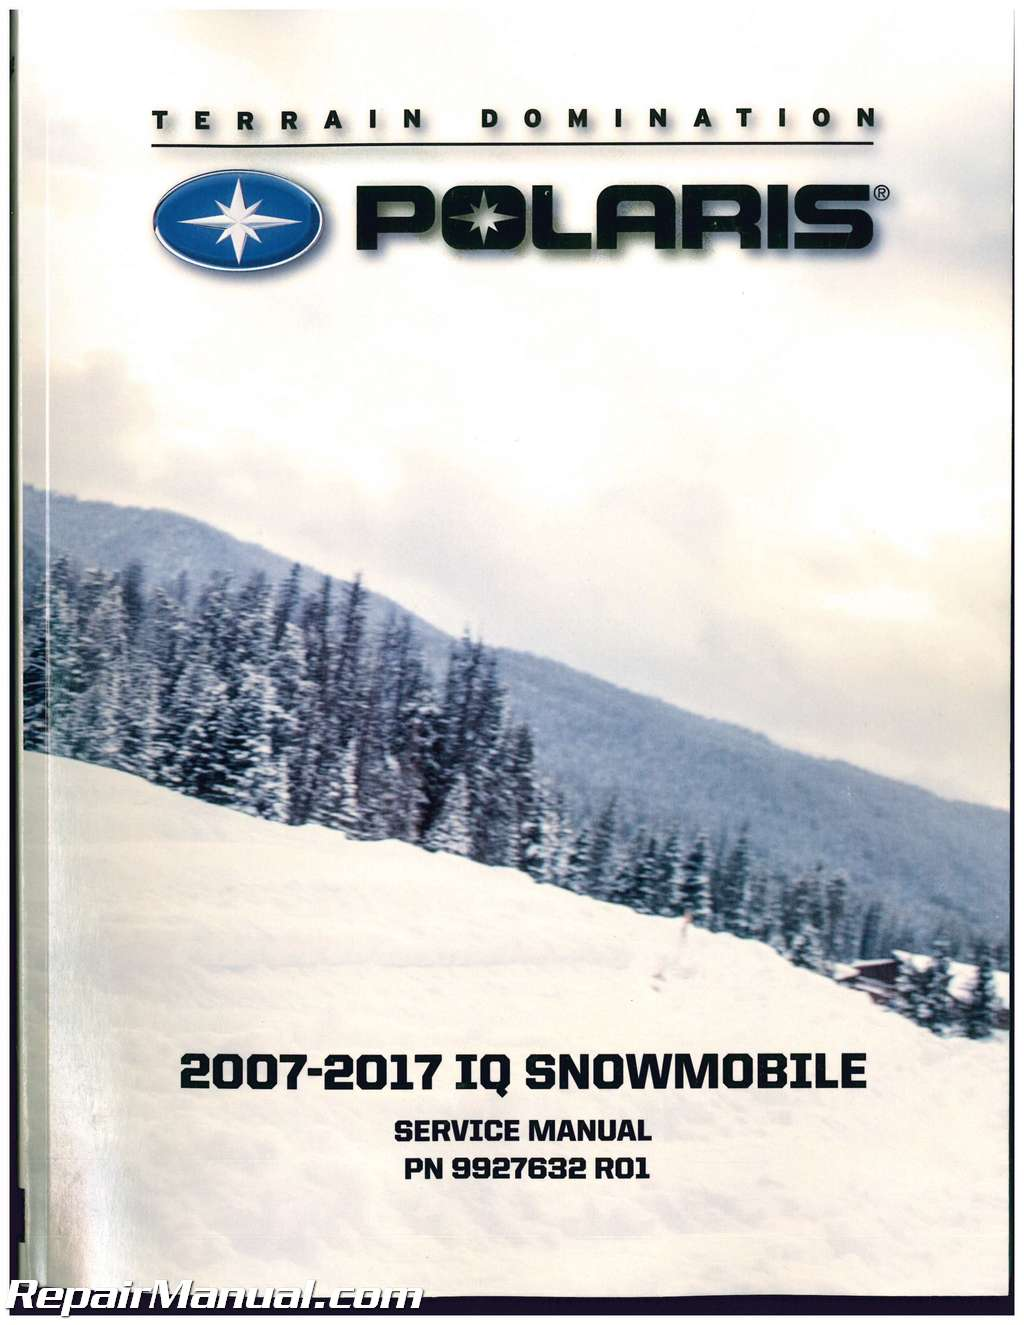 2011 polaris switch back 600 wiring diagram | manual e-books.